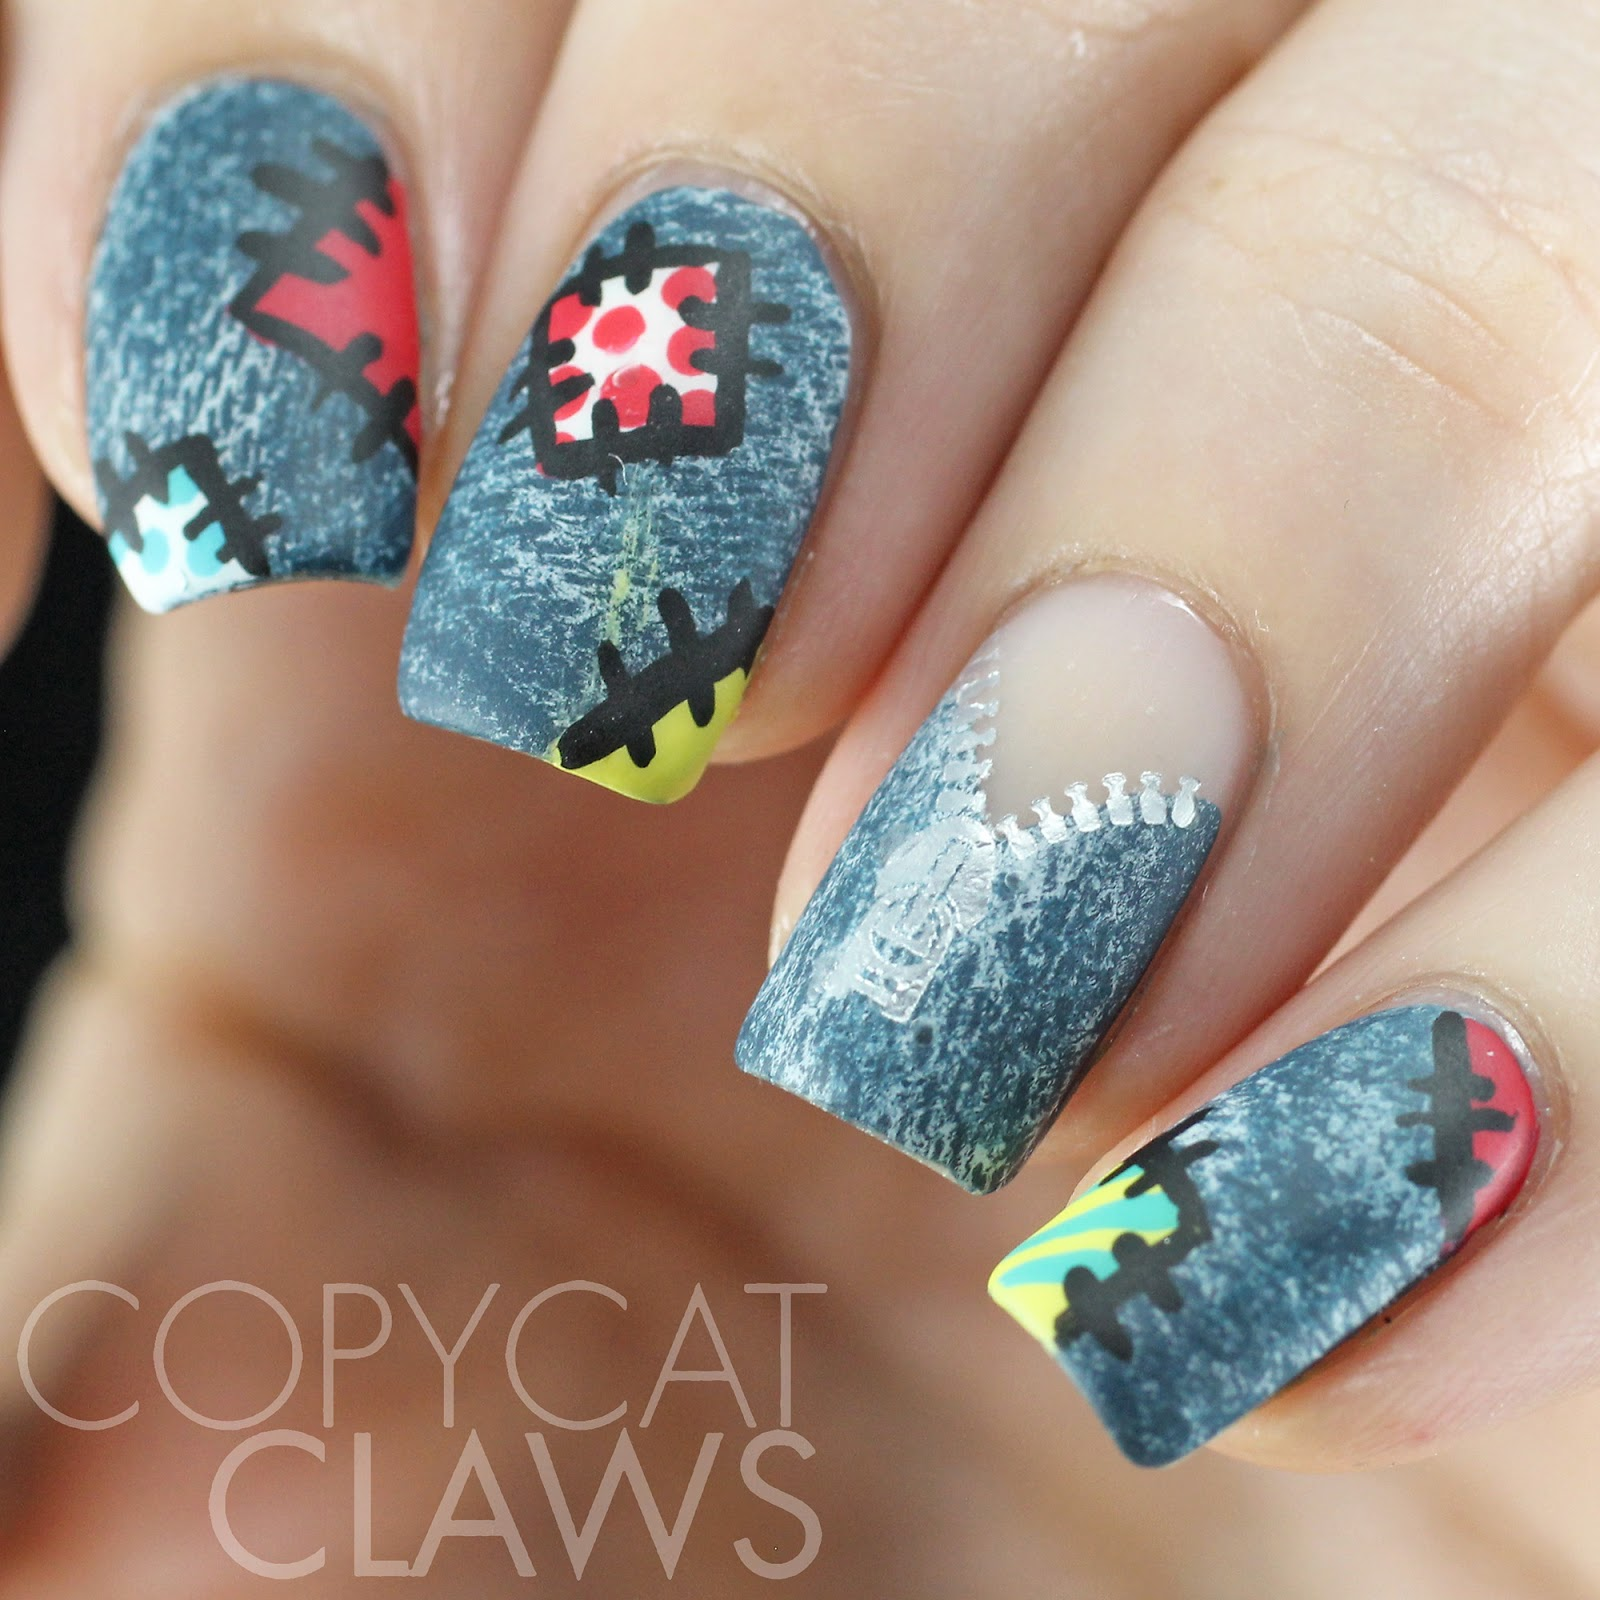 Copycat Claws: Patchwork Denim Nail Art